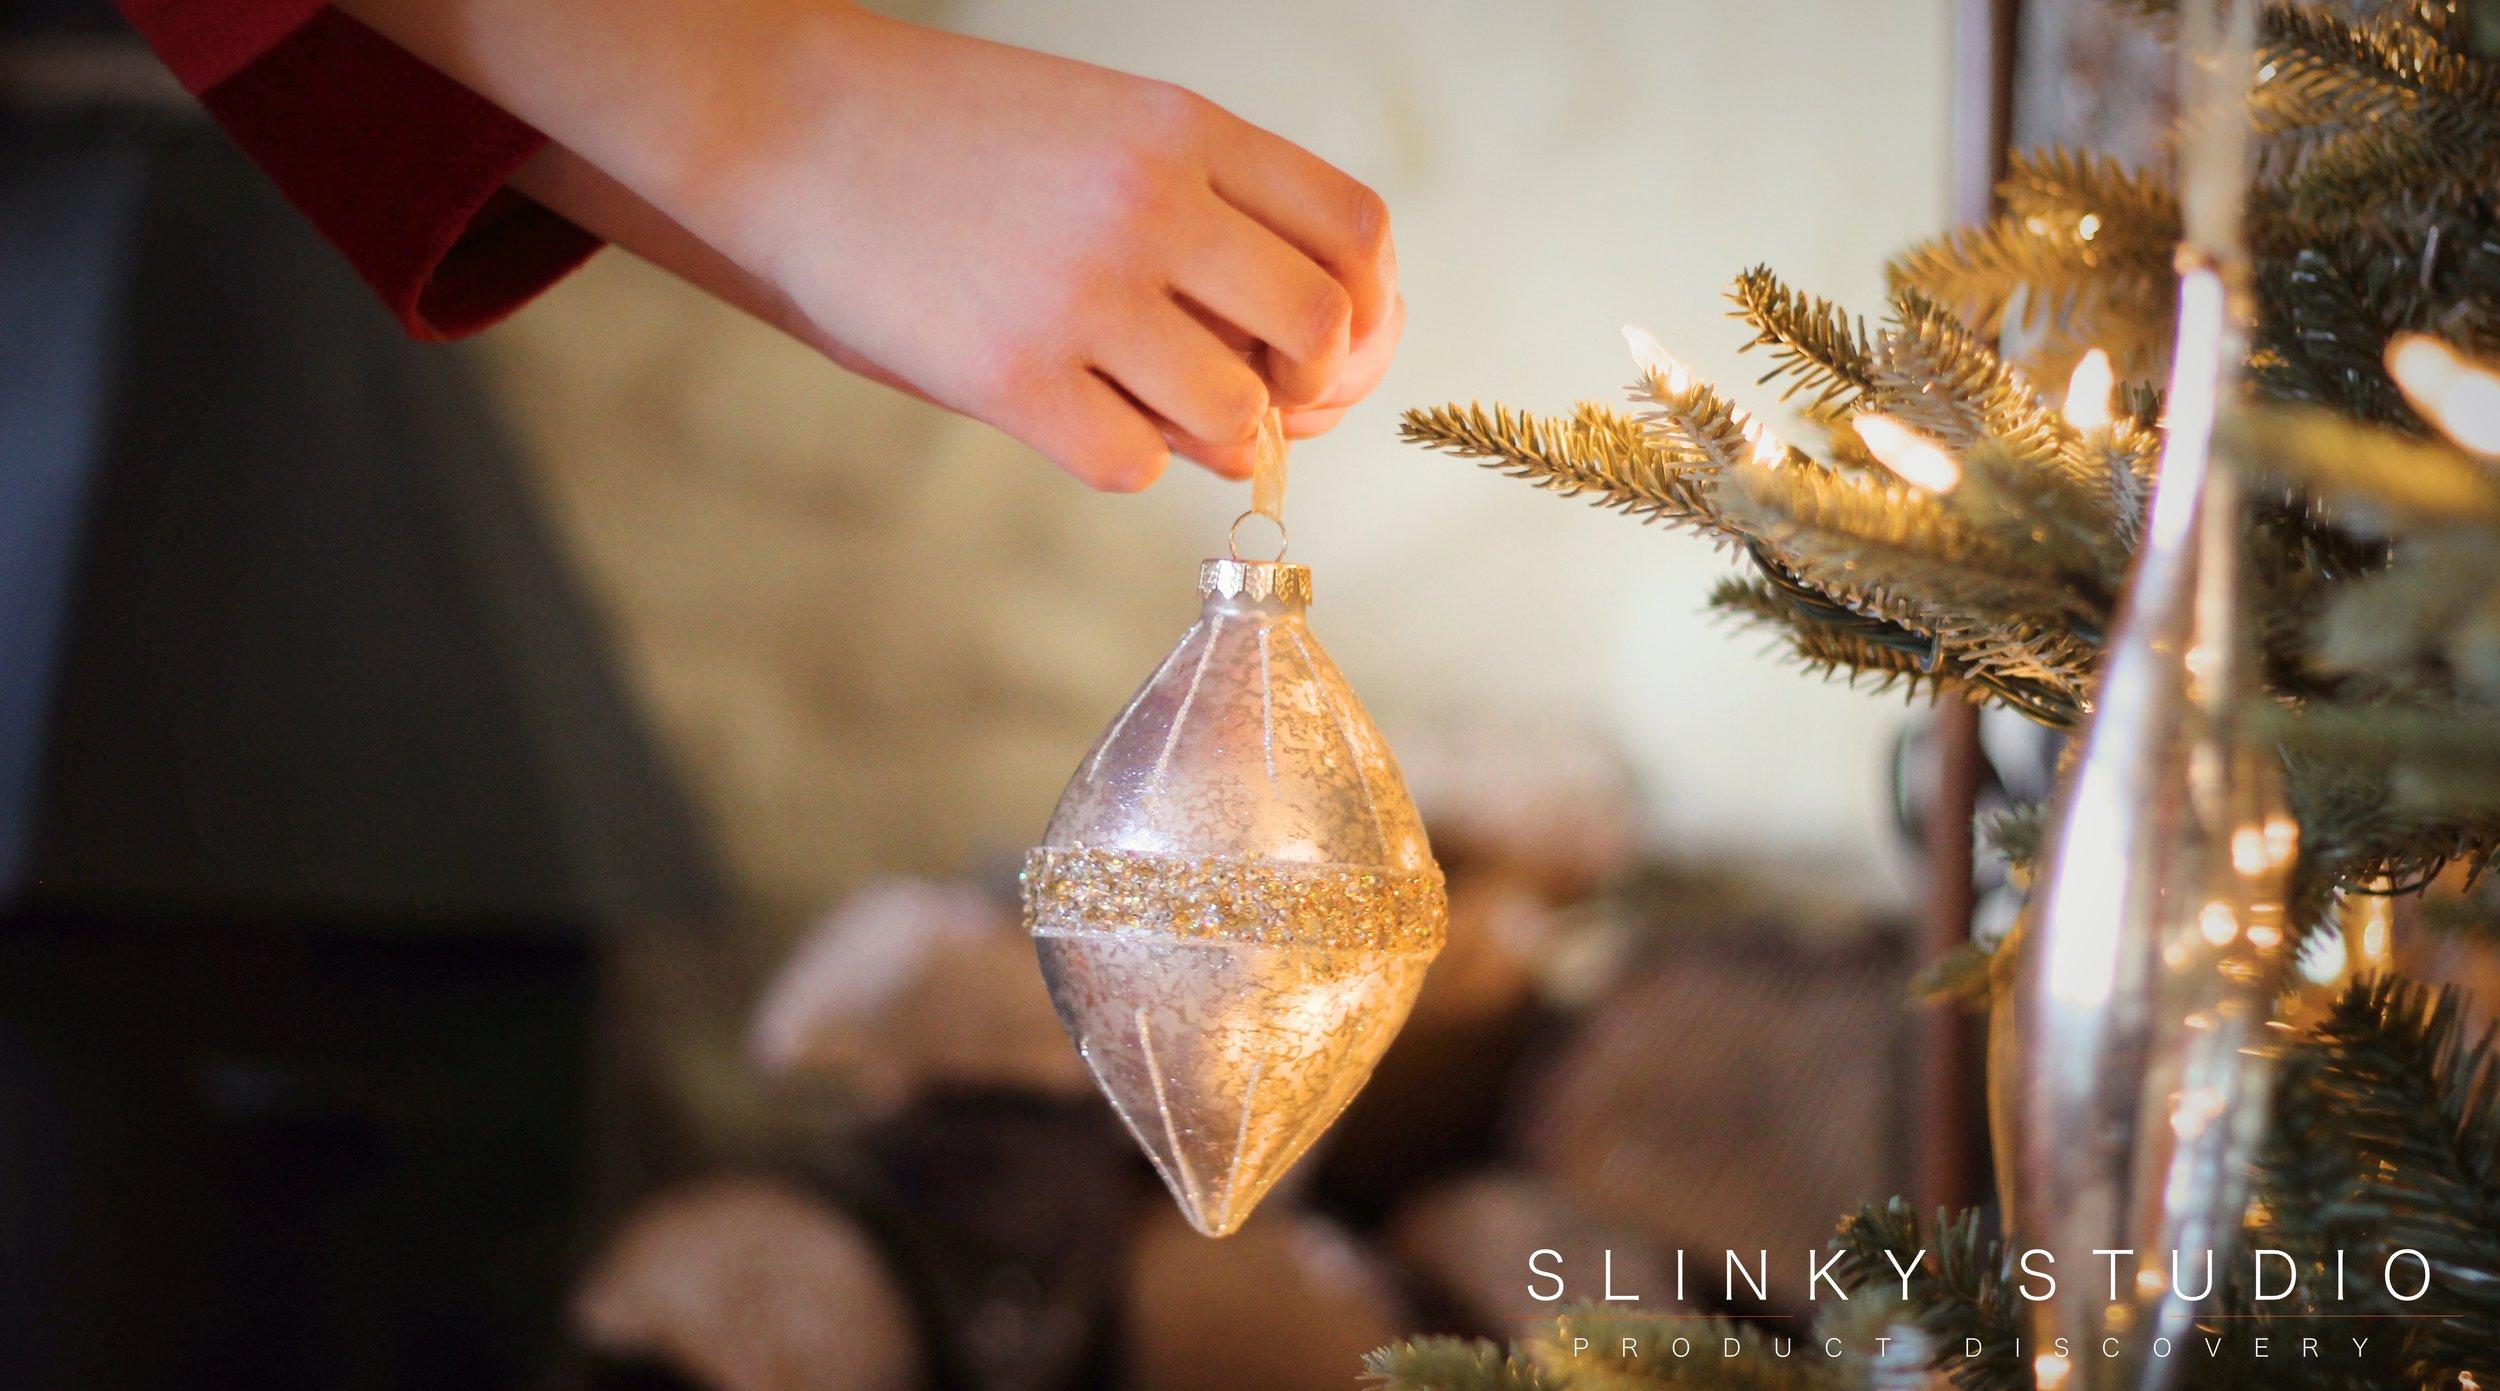 Balsam Hill Fraser Fir Christmas Tree Putting Ornament Decoration on Branch.jpg